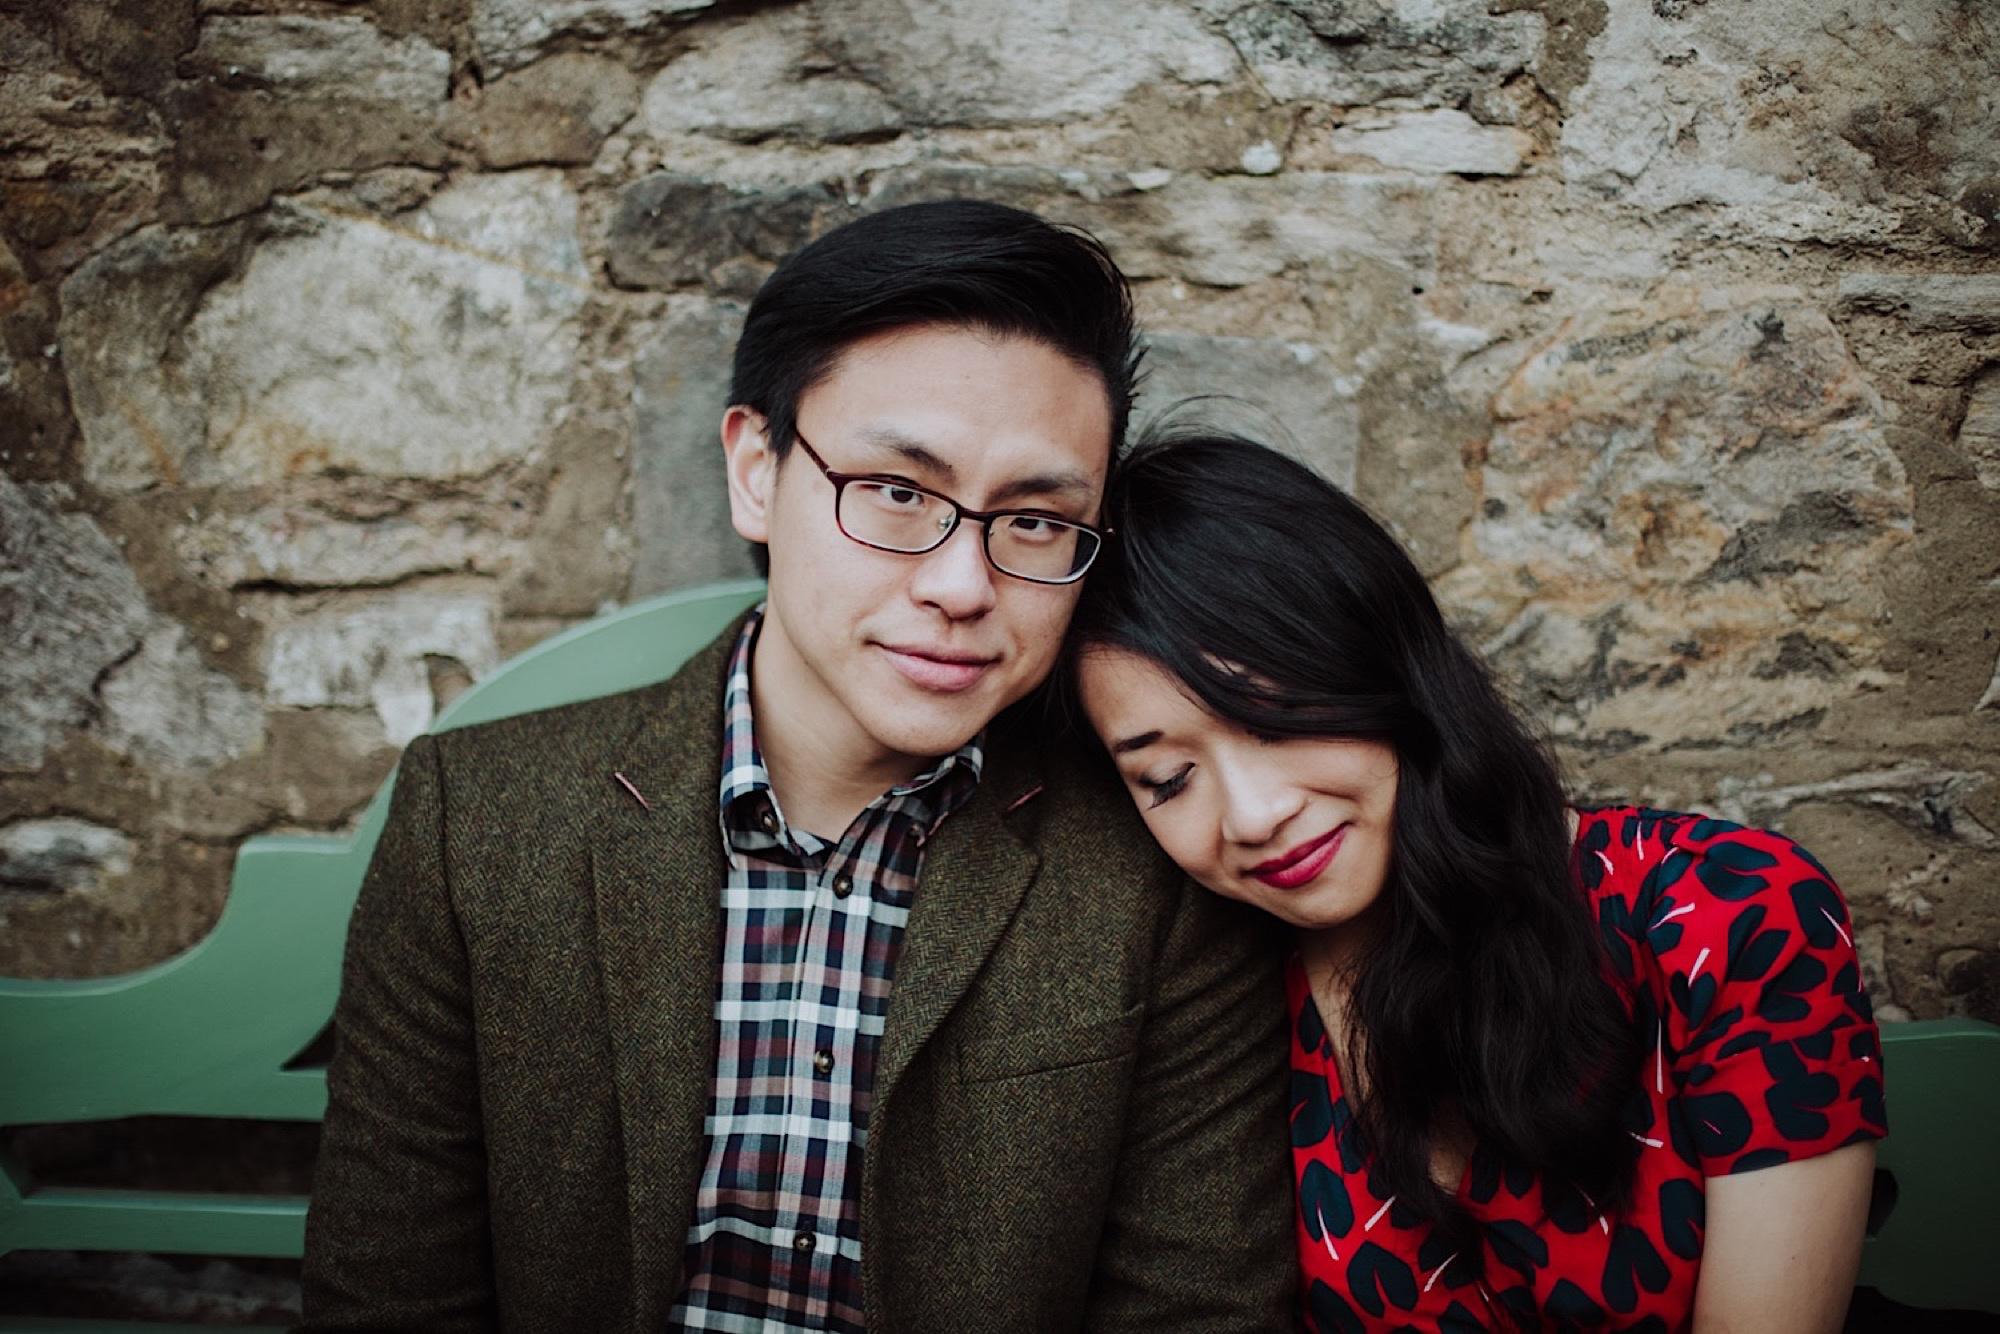 edinburgh engagement photo session